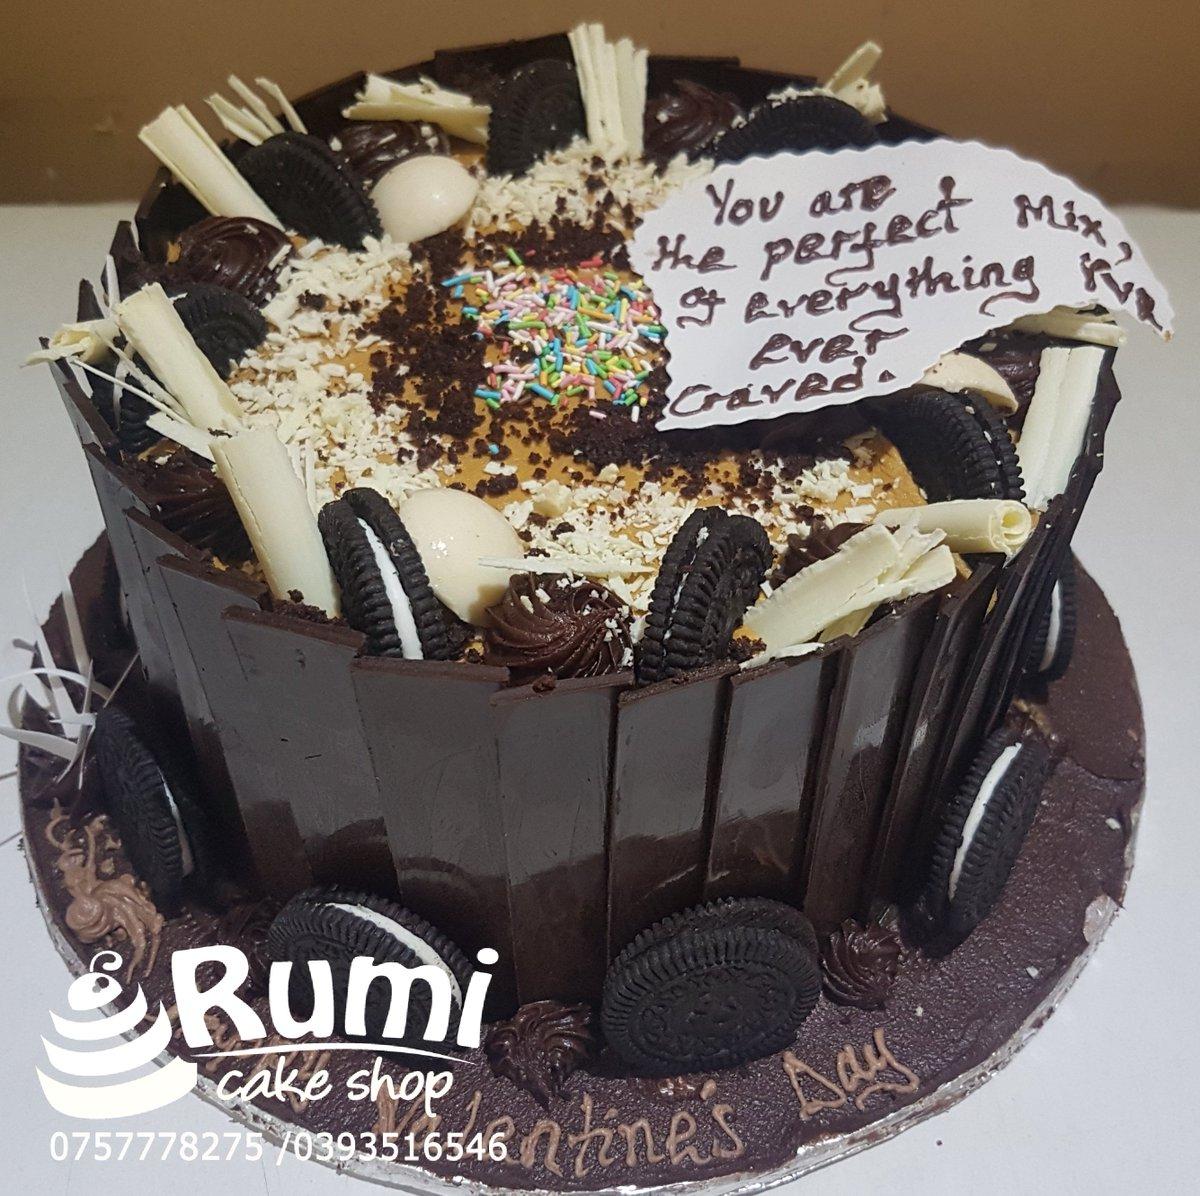 Terrific Rumi Cake Shop On Twitter Say It With Chocolate Cake This Funny Birthday Cards Online Benoljebrpdamsfinfo